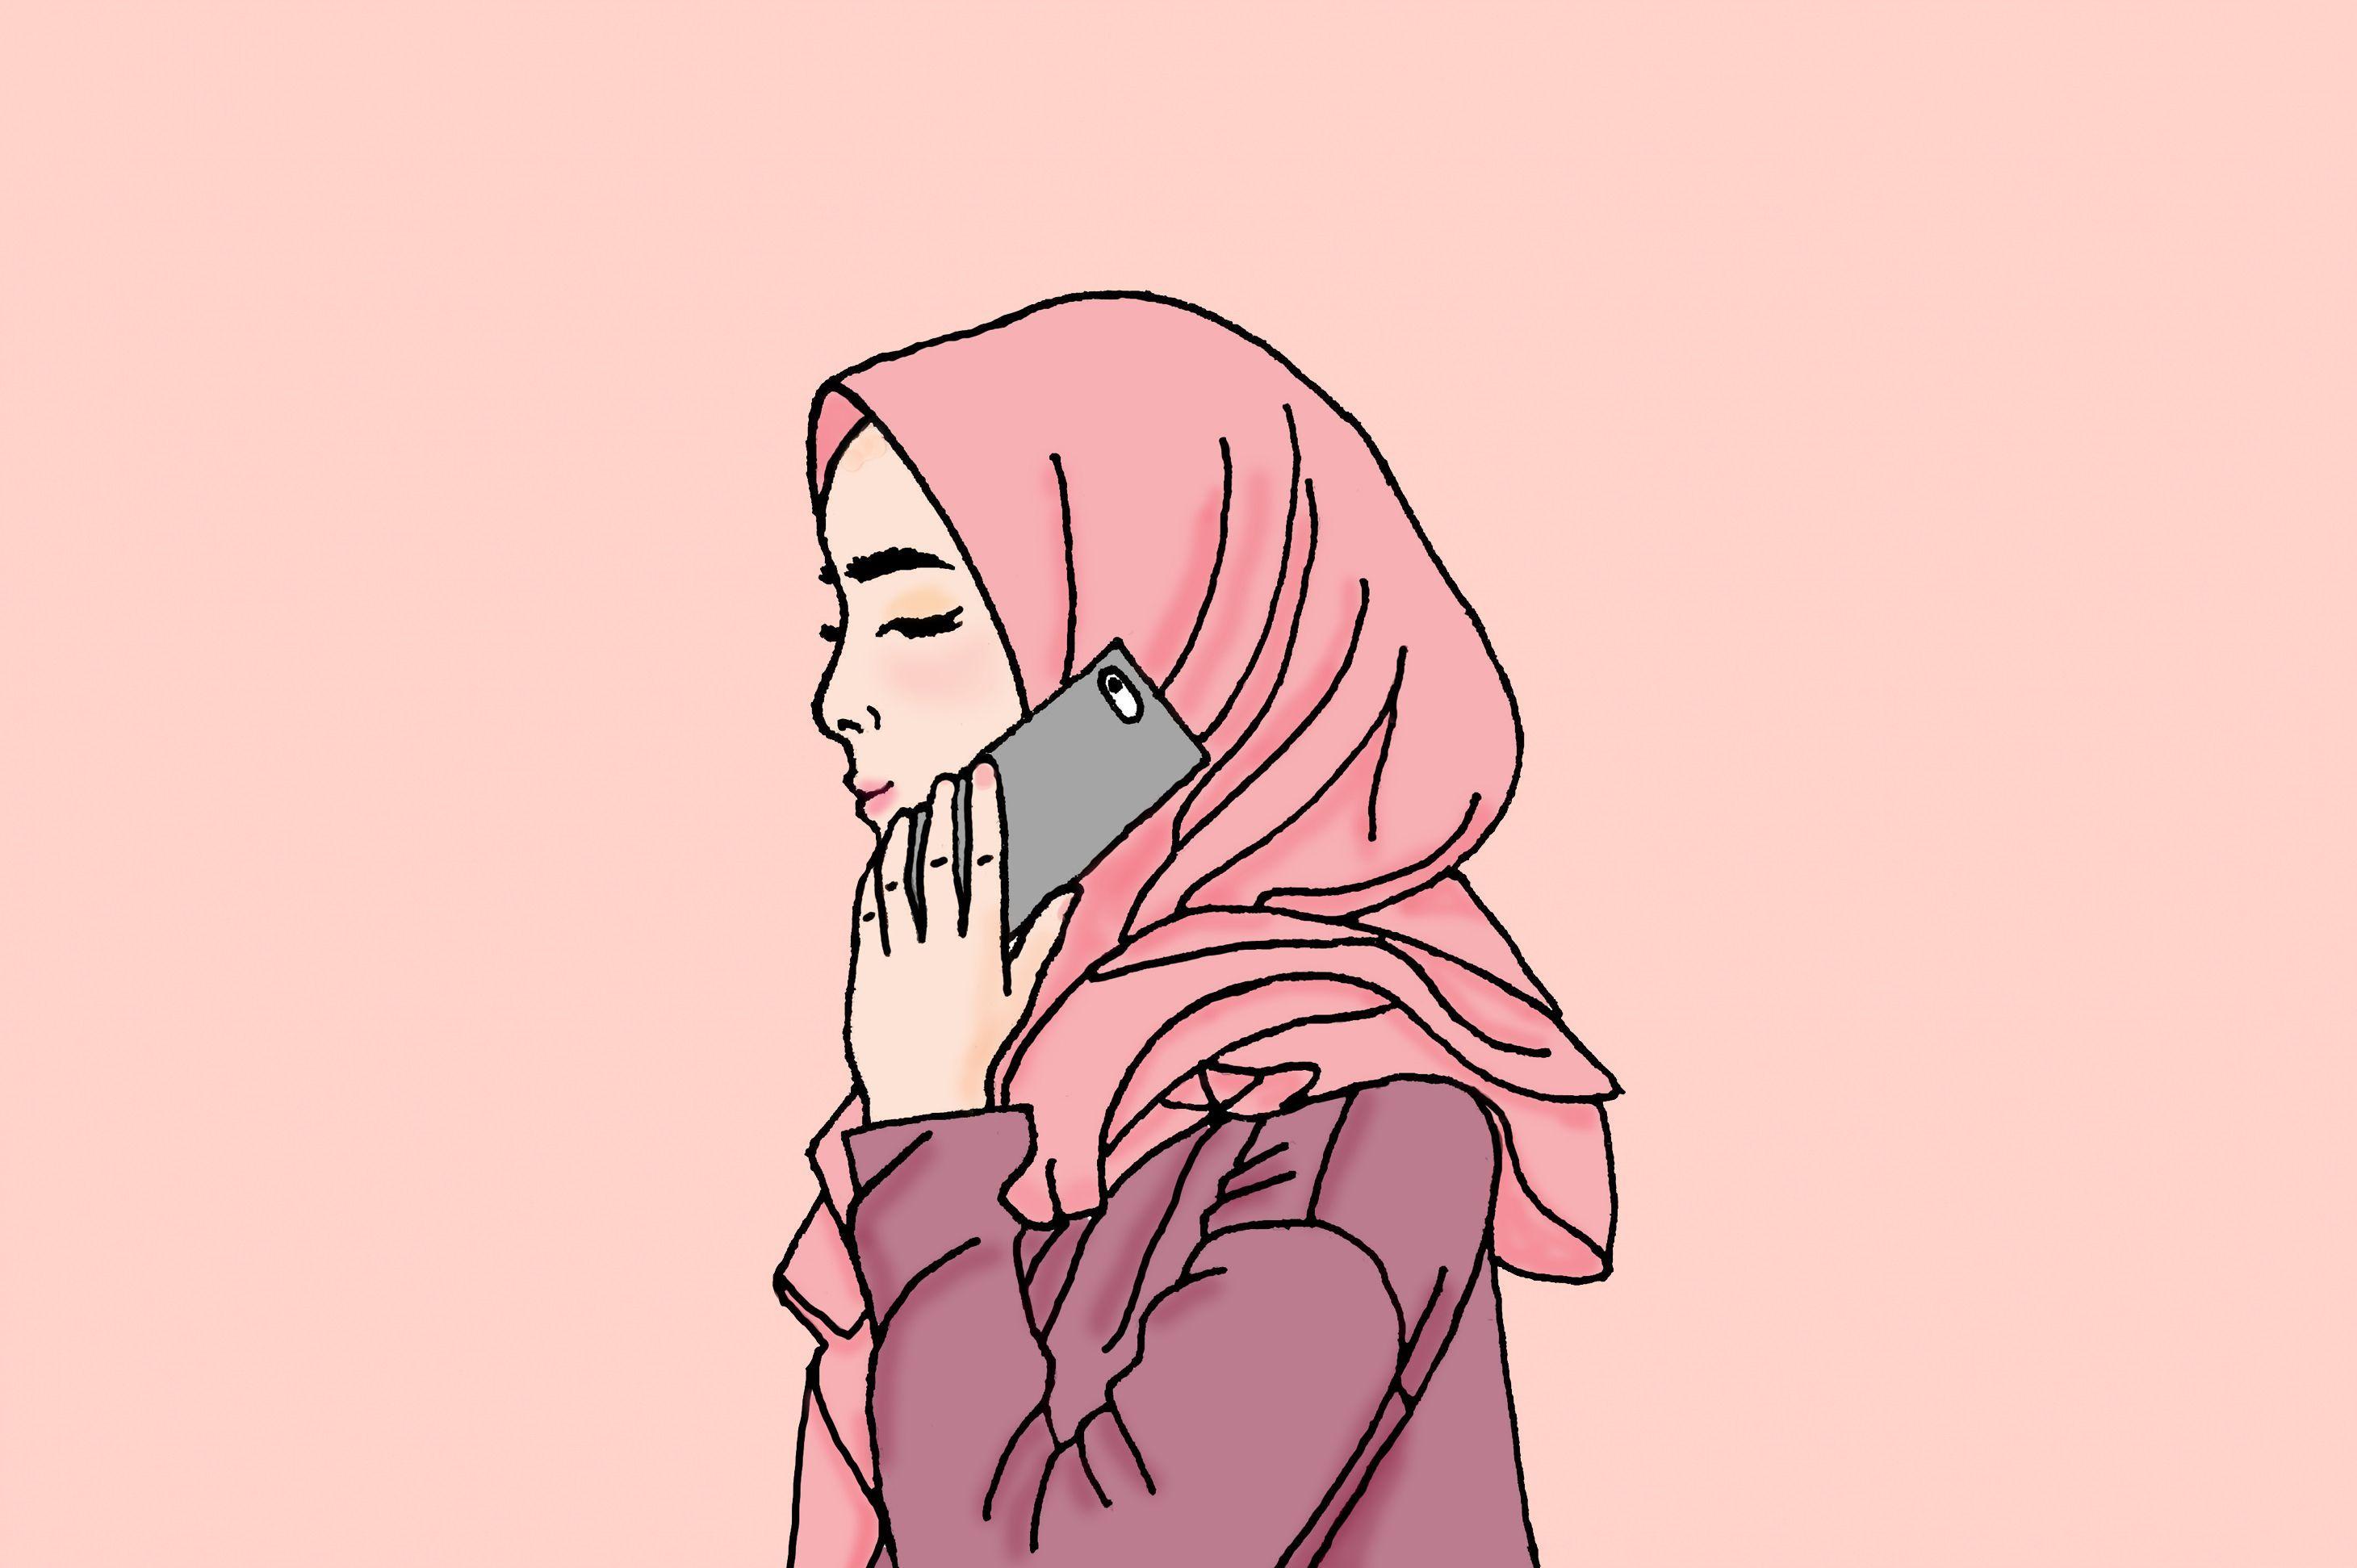 kartun sahabat muslimah cantik Anime muslim, Cartoon art